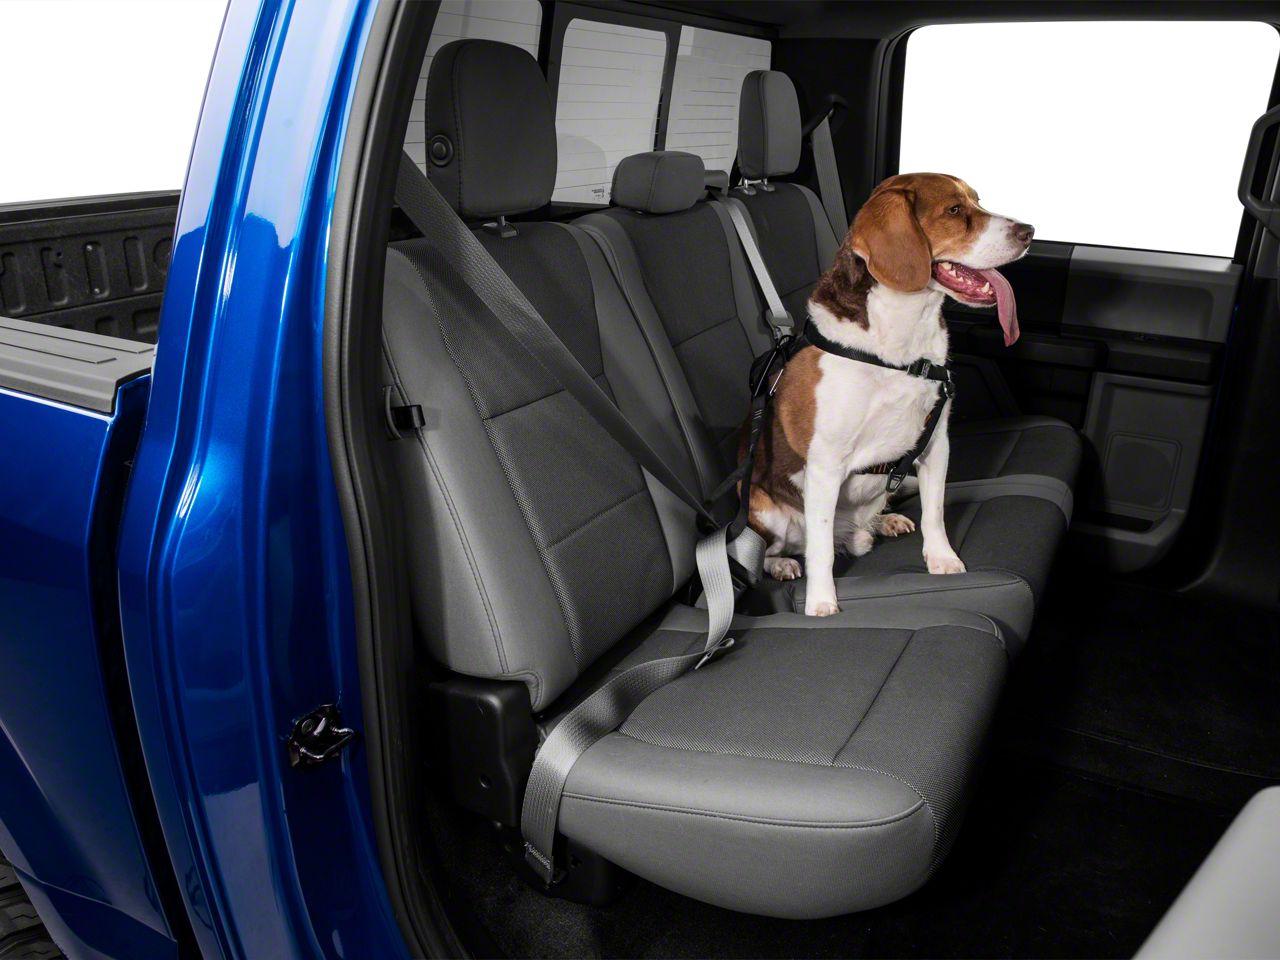 Kurgo Extended Strength Tru-Fit Dog Harness w/ Seat Belt Tether - Black (97-19 F-150)